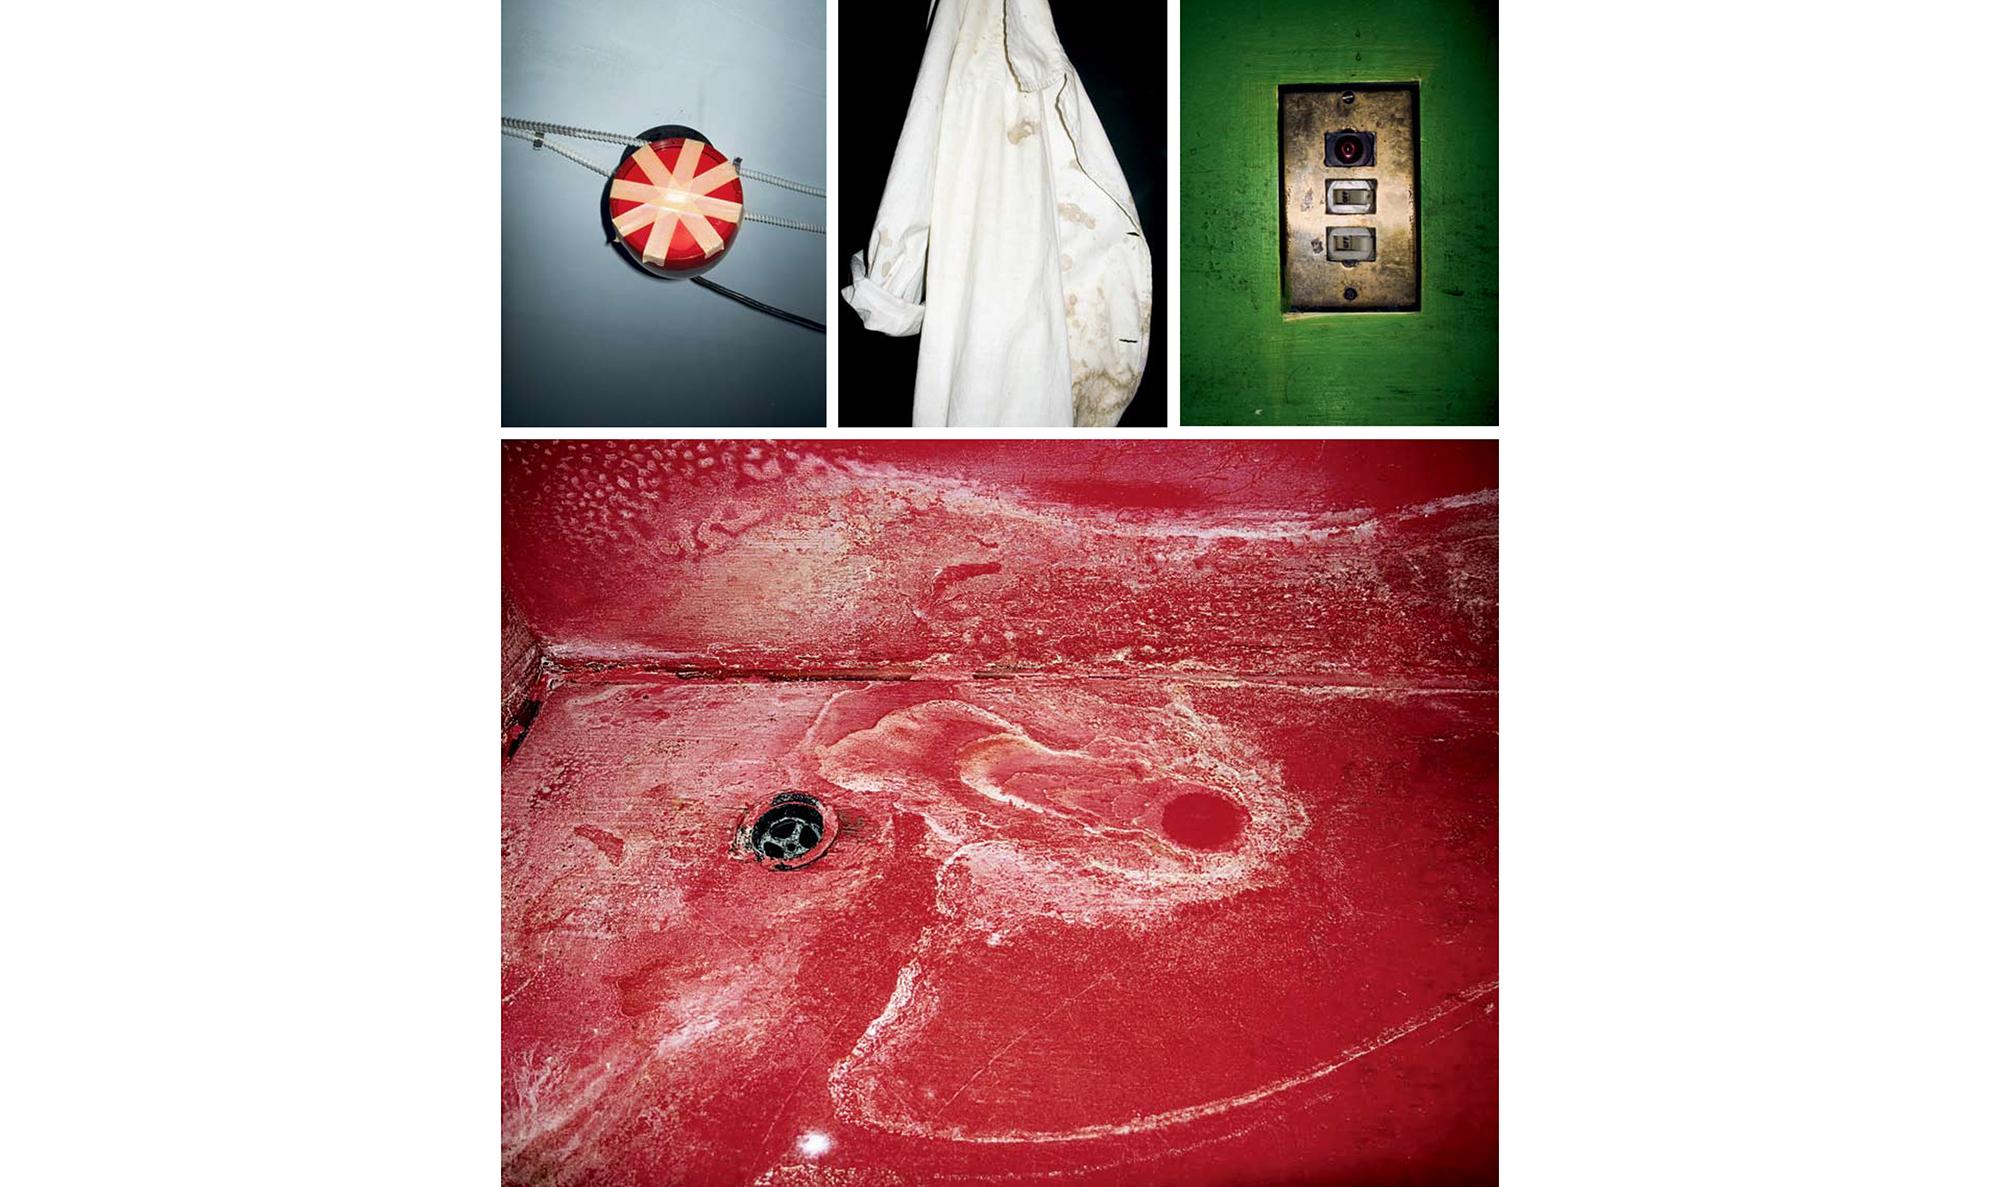 Magazine Aperture, Darkroom, R.I.P. , by Martin Parr, New York, USA, 2007